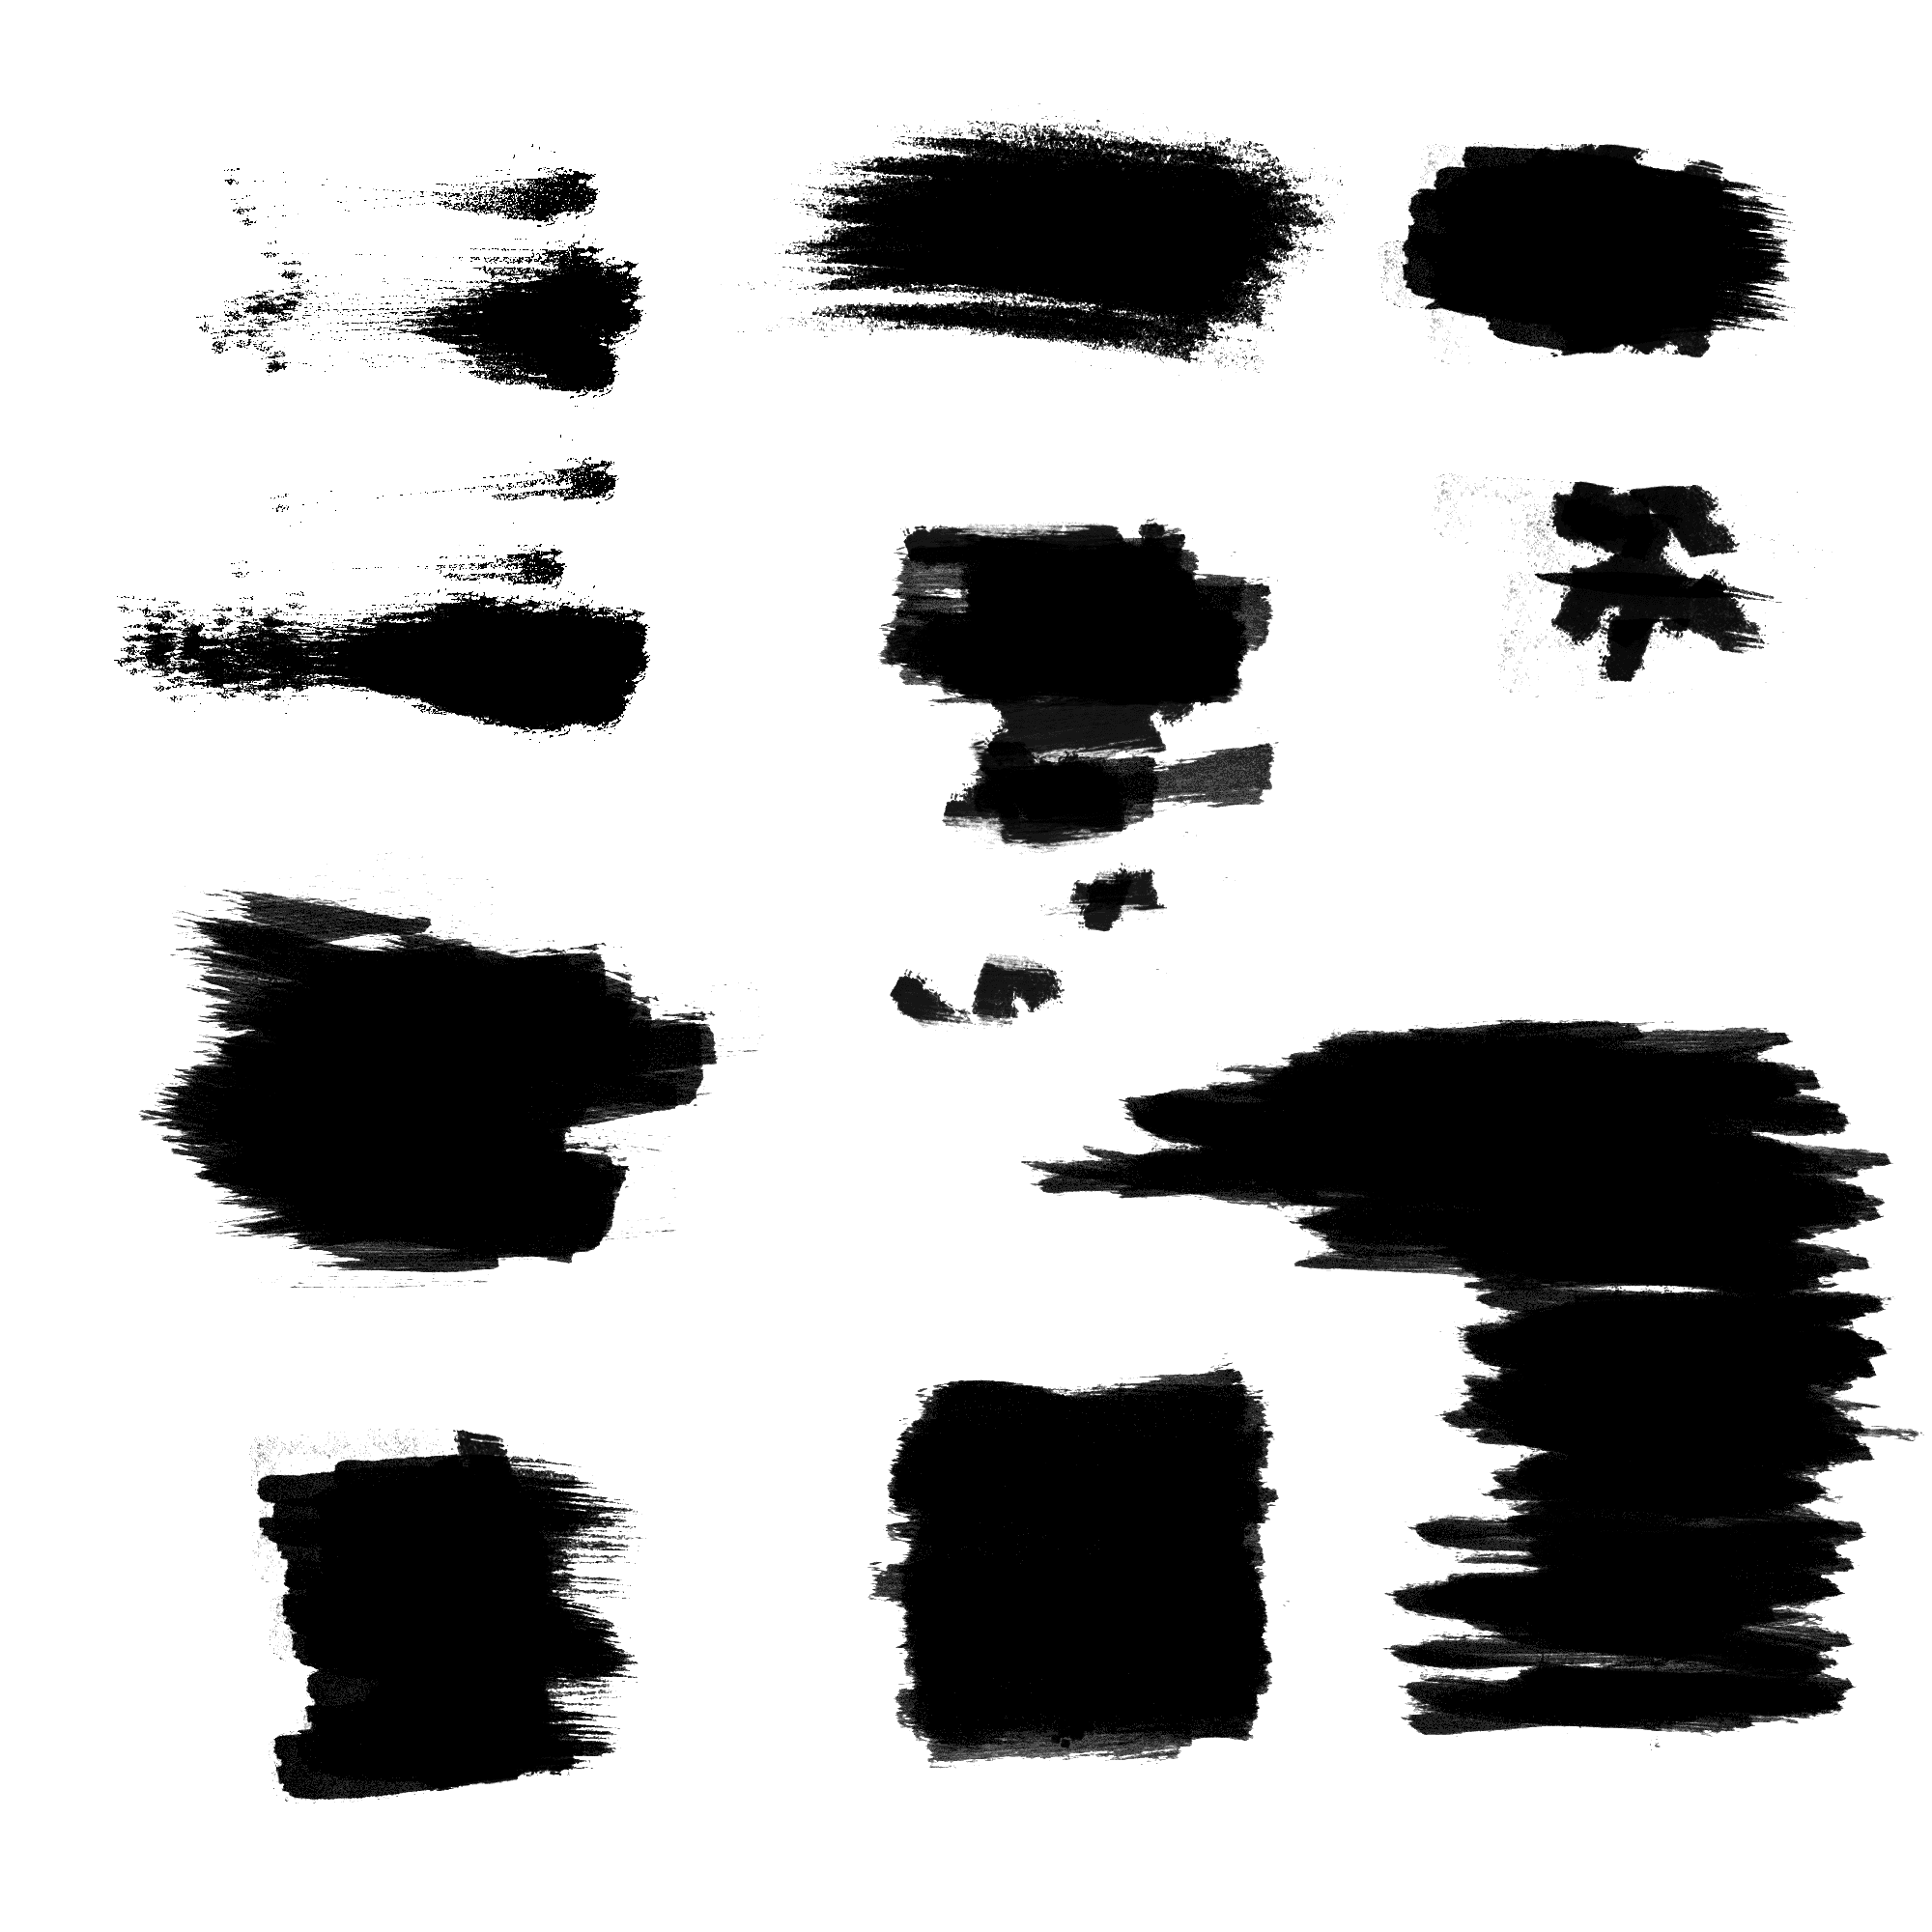 trzown-dry-filler-cheatsheet-1.png